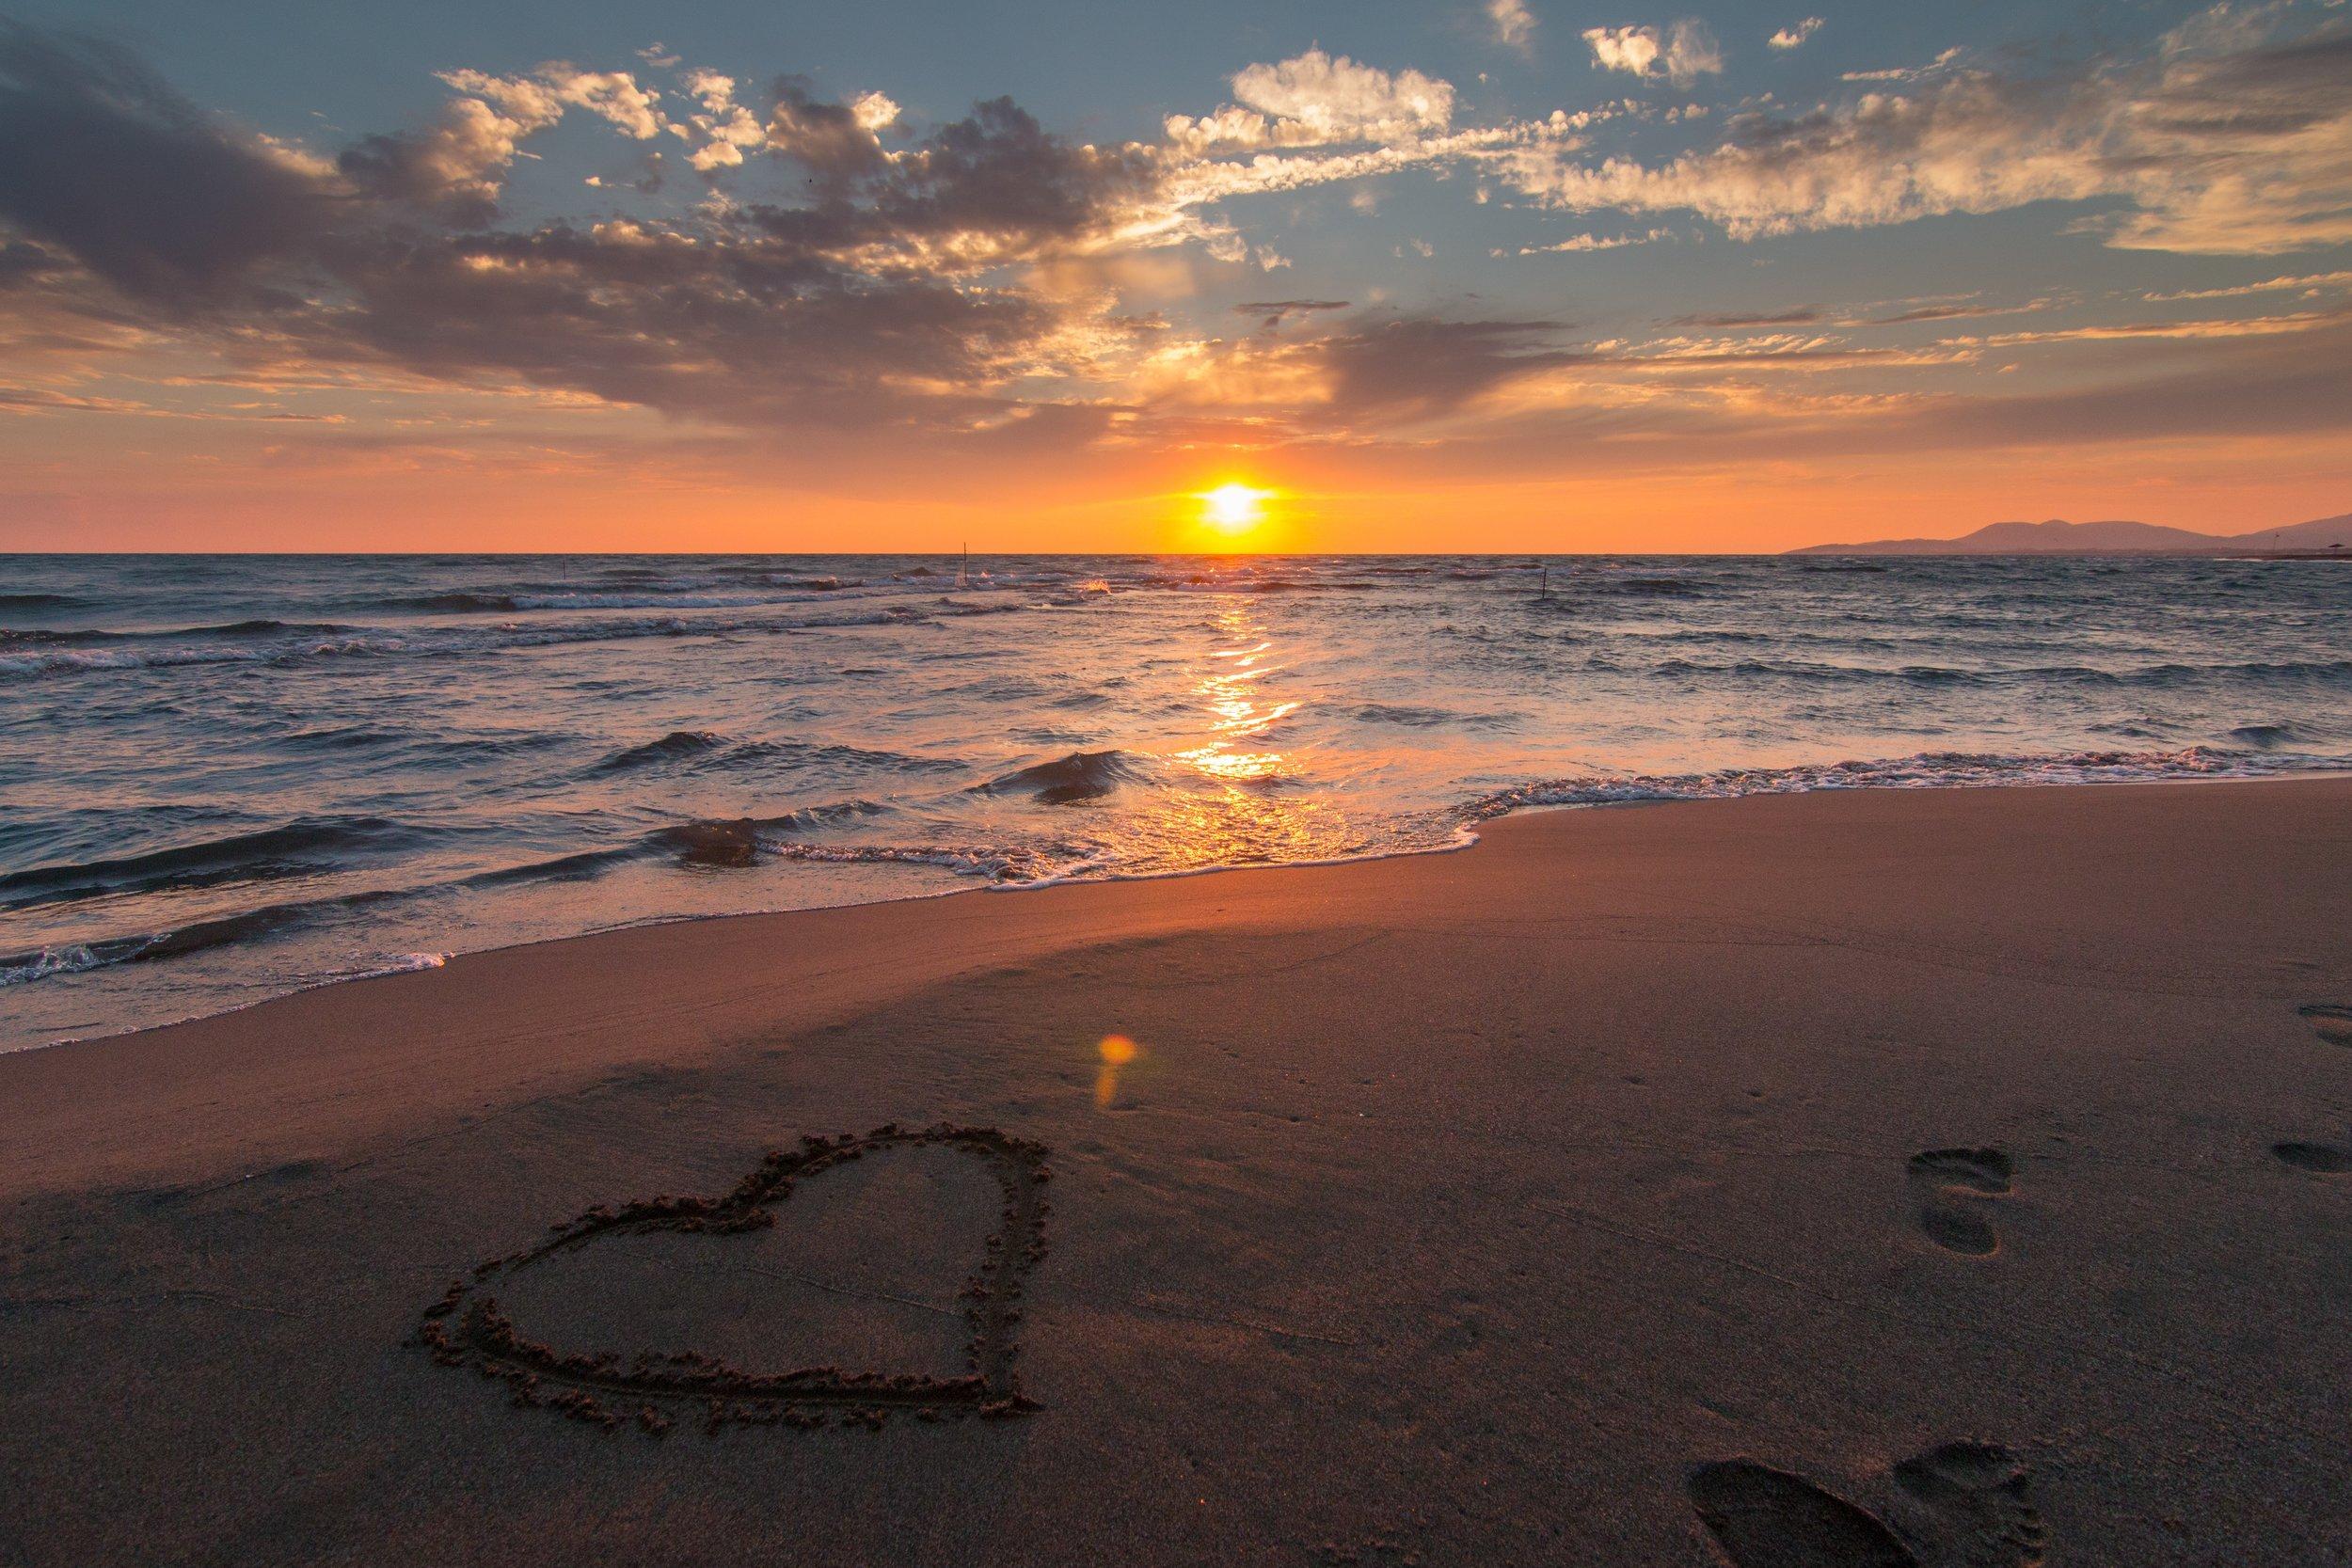 uwm.love.beach.pexels-photo-269583